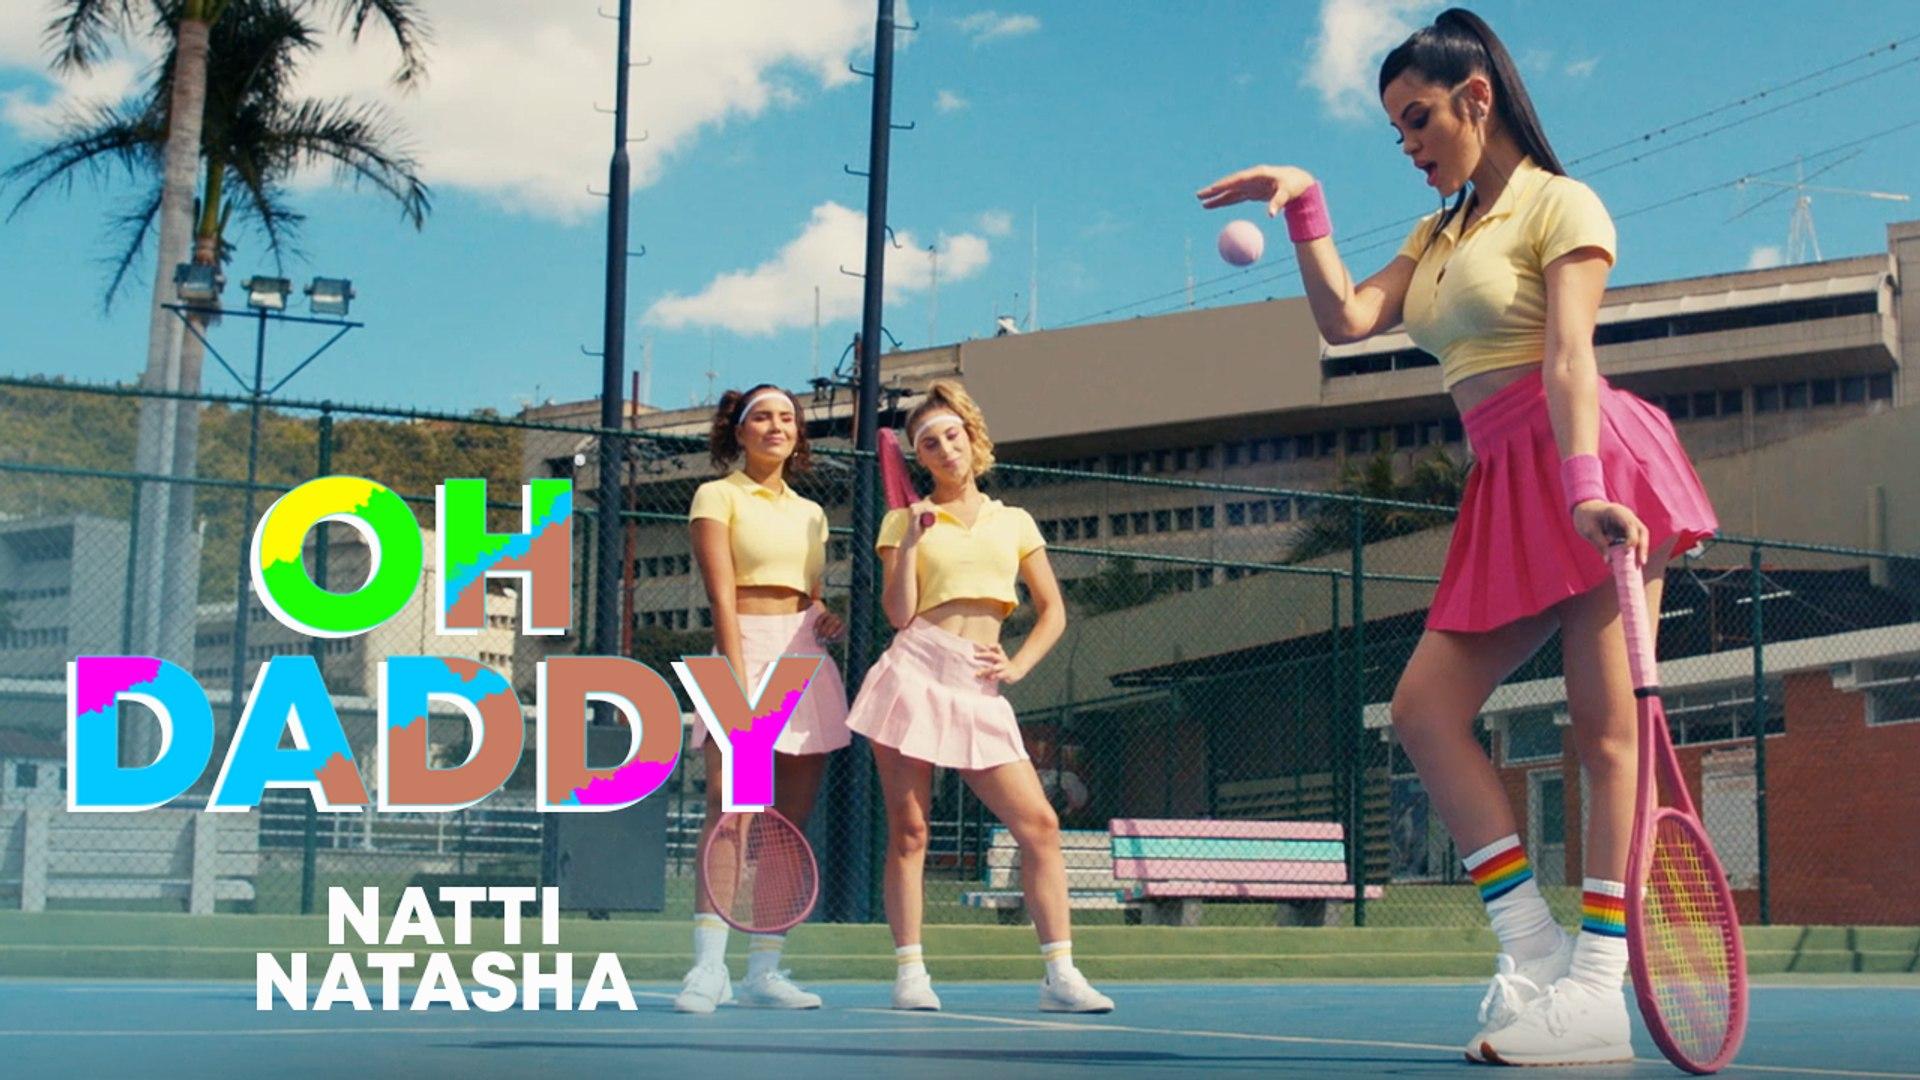 Natti Natasha | Oh Daddy